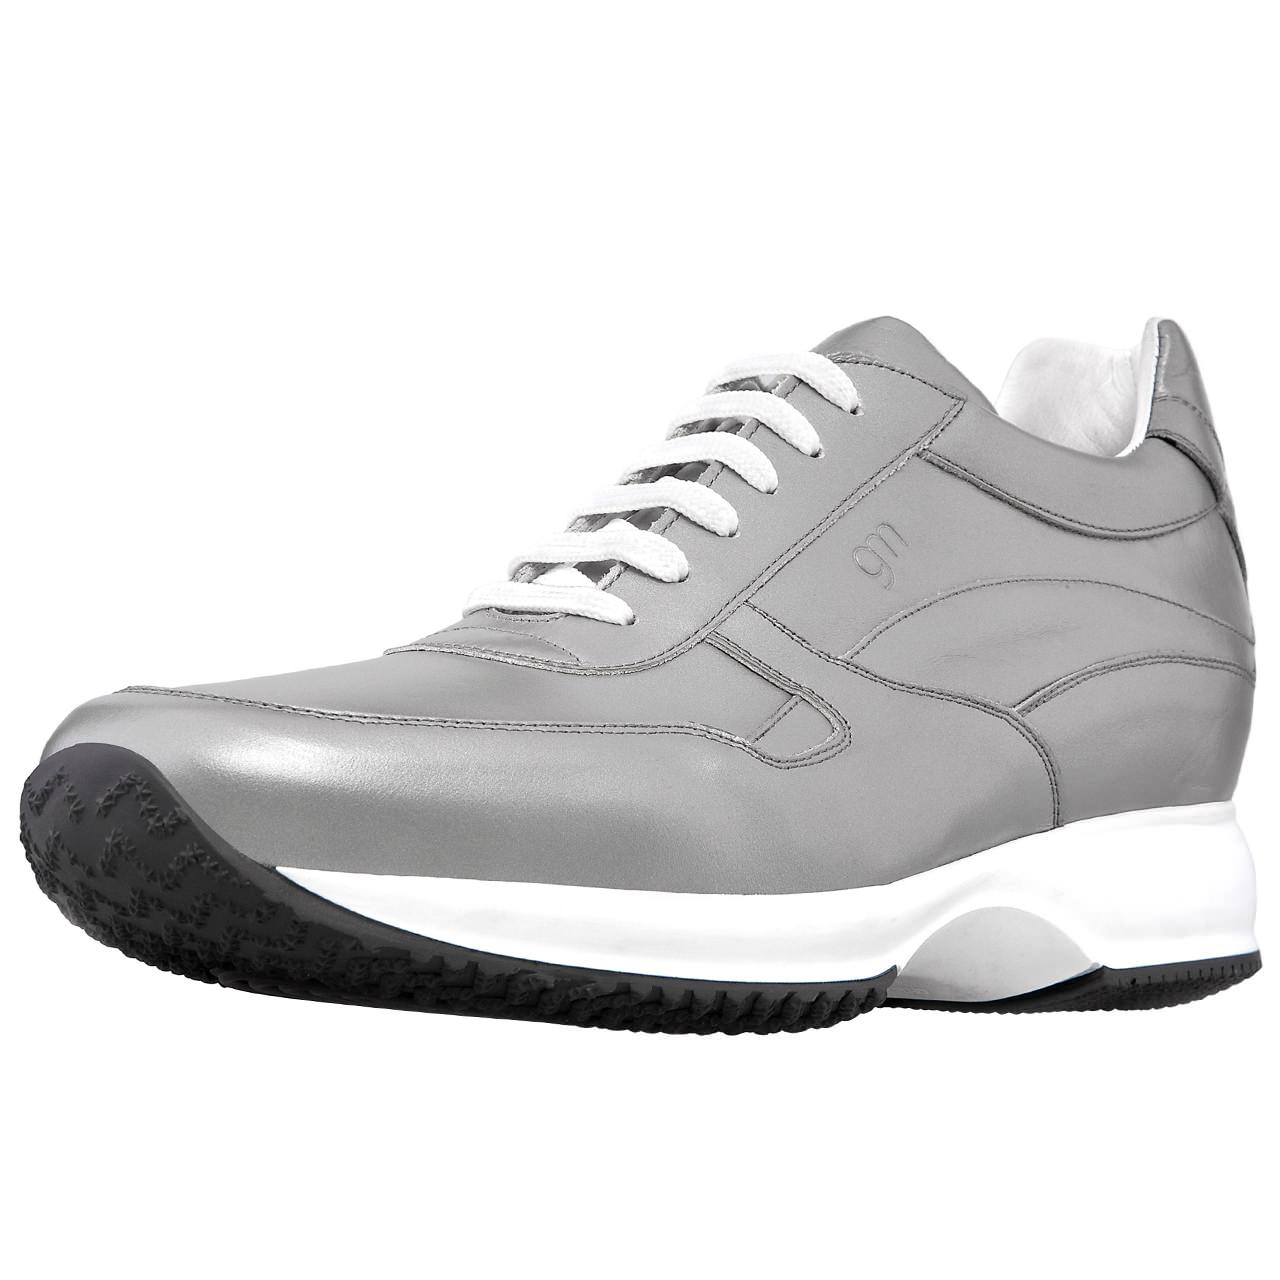 Guidomaggi Barcelona Sneakers Rialzo Con Calzature Rialzate wPxpqZpgz 0d1f9406f6d